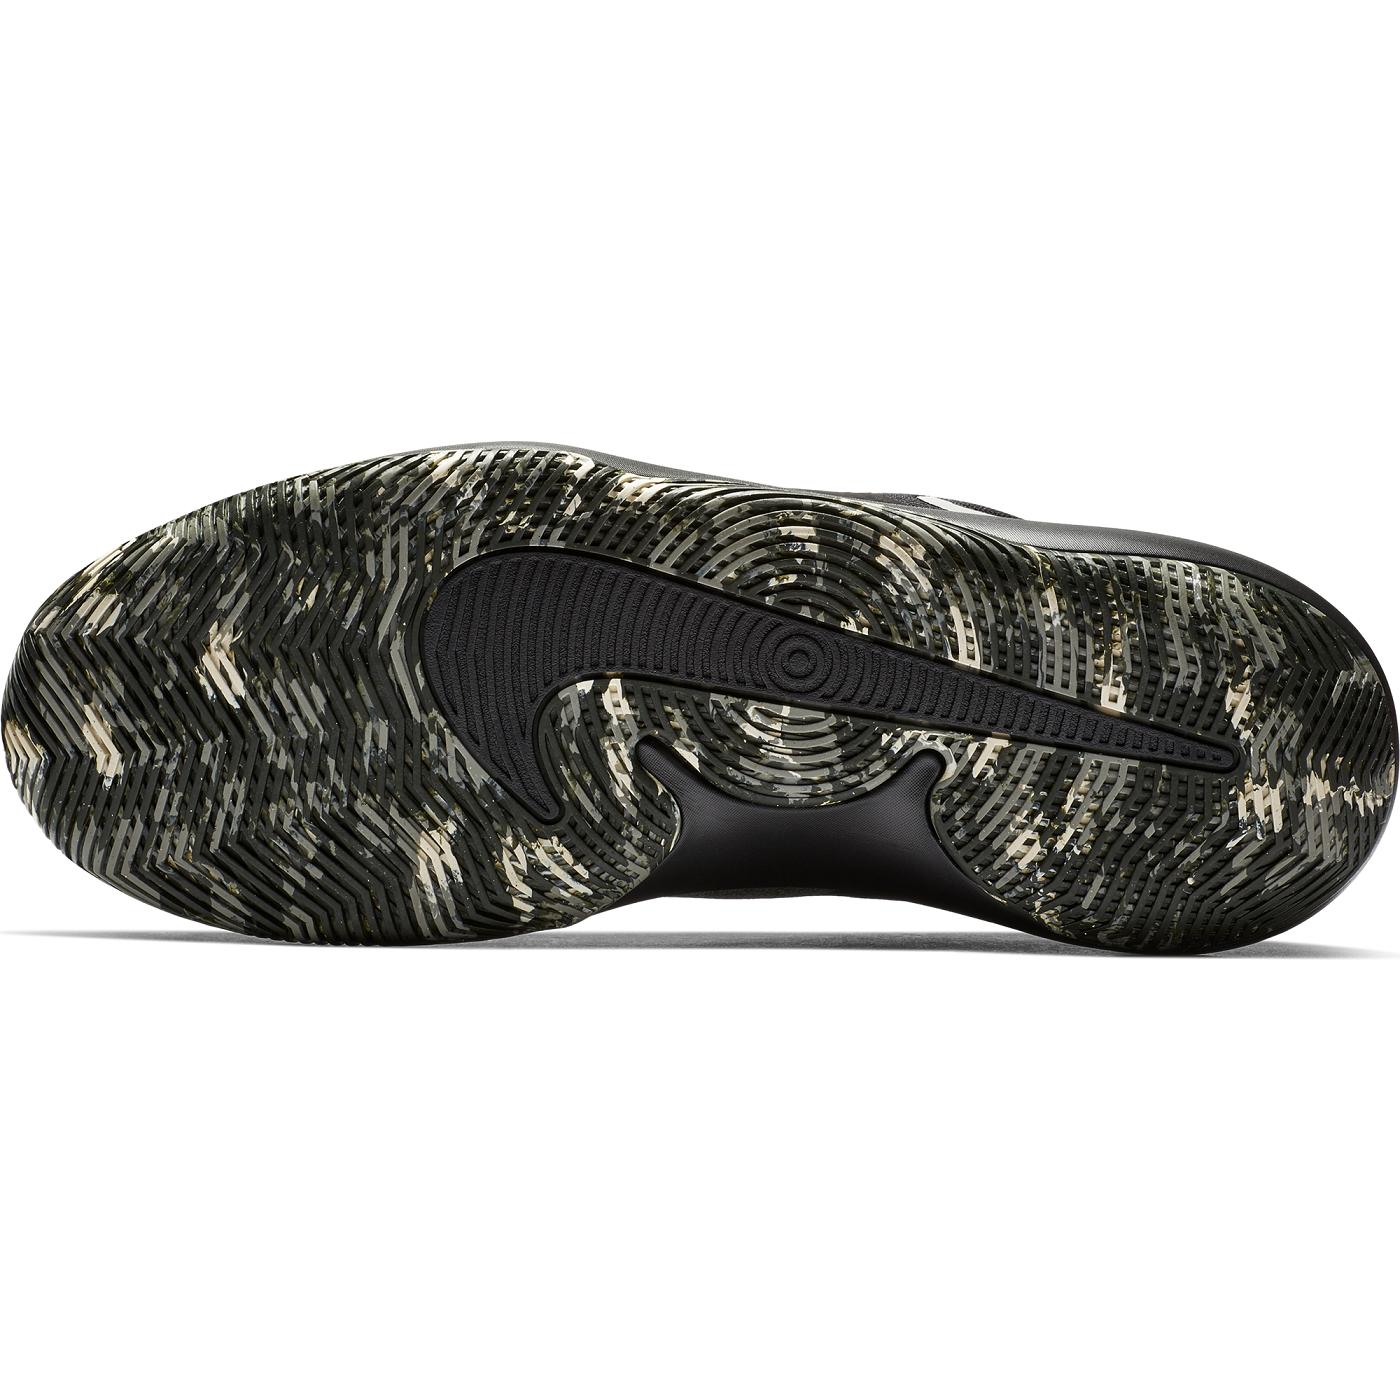 c17b575f458 Nike Air Precision II